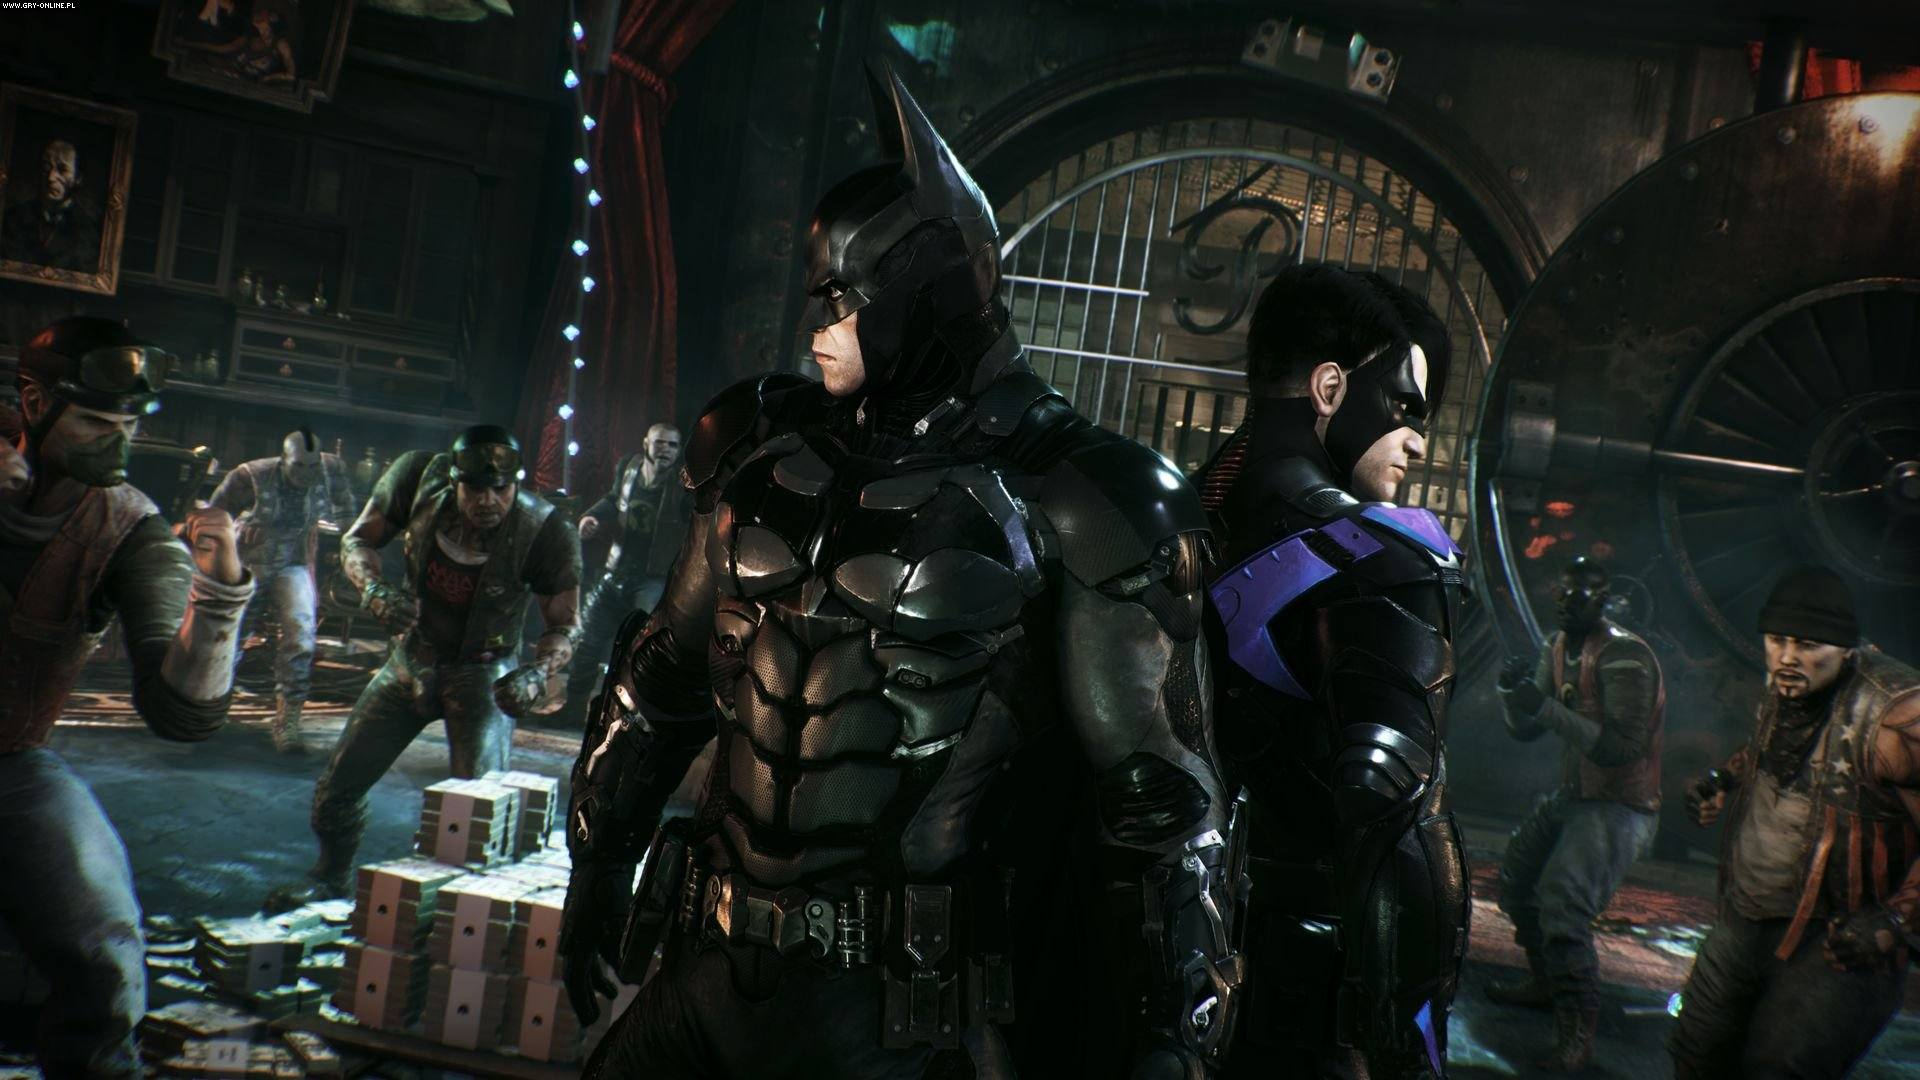 Batman Arkham Knight image #6